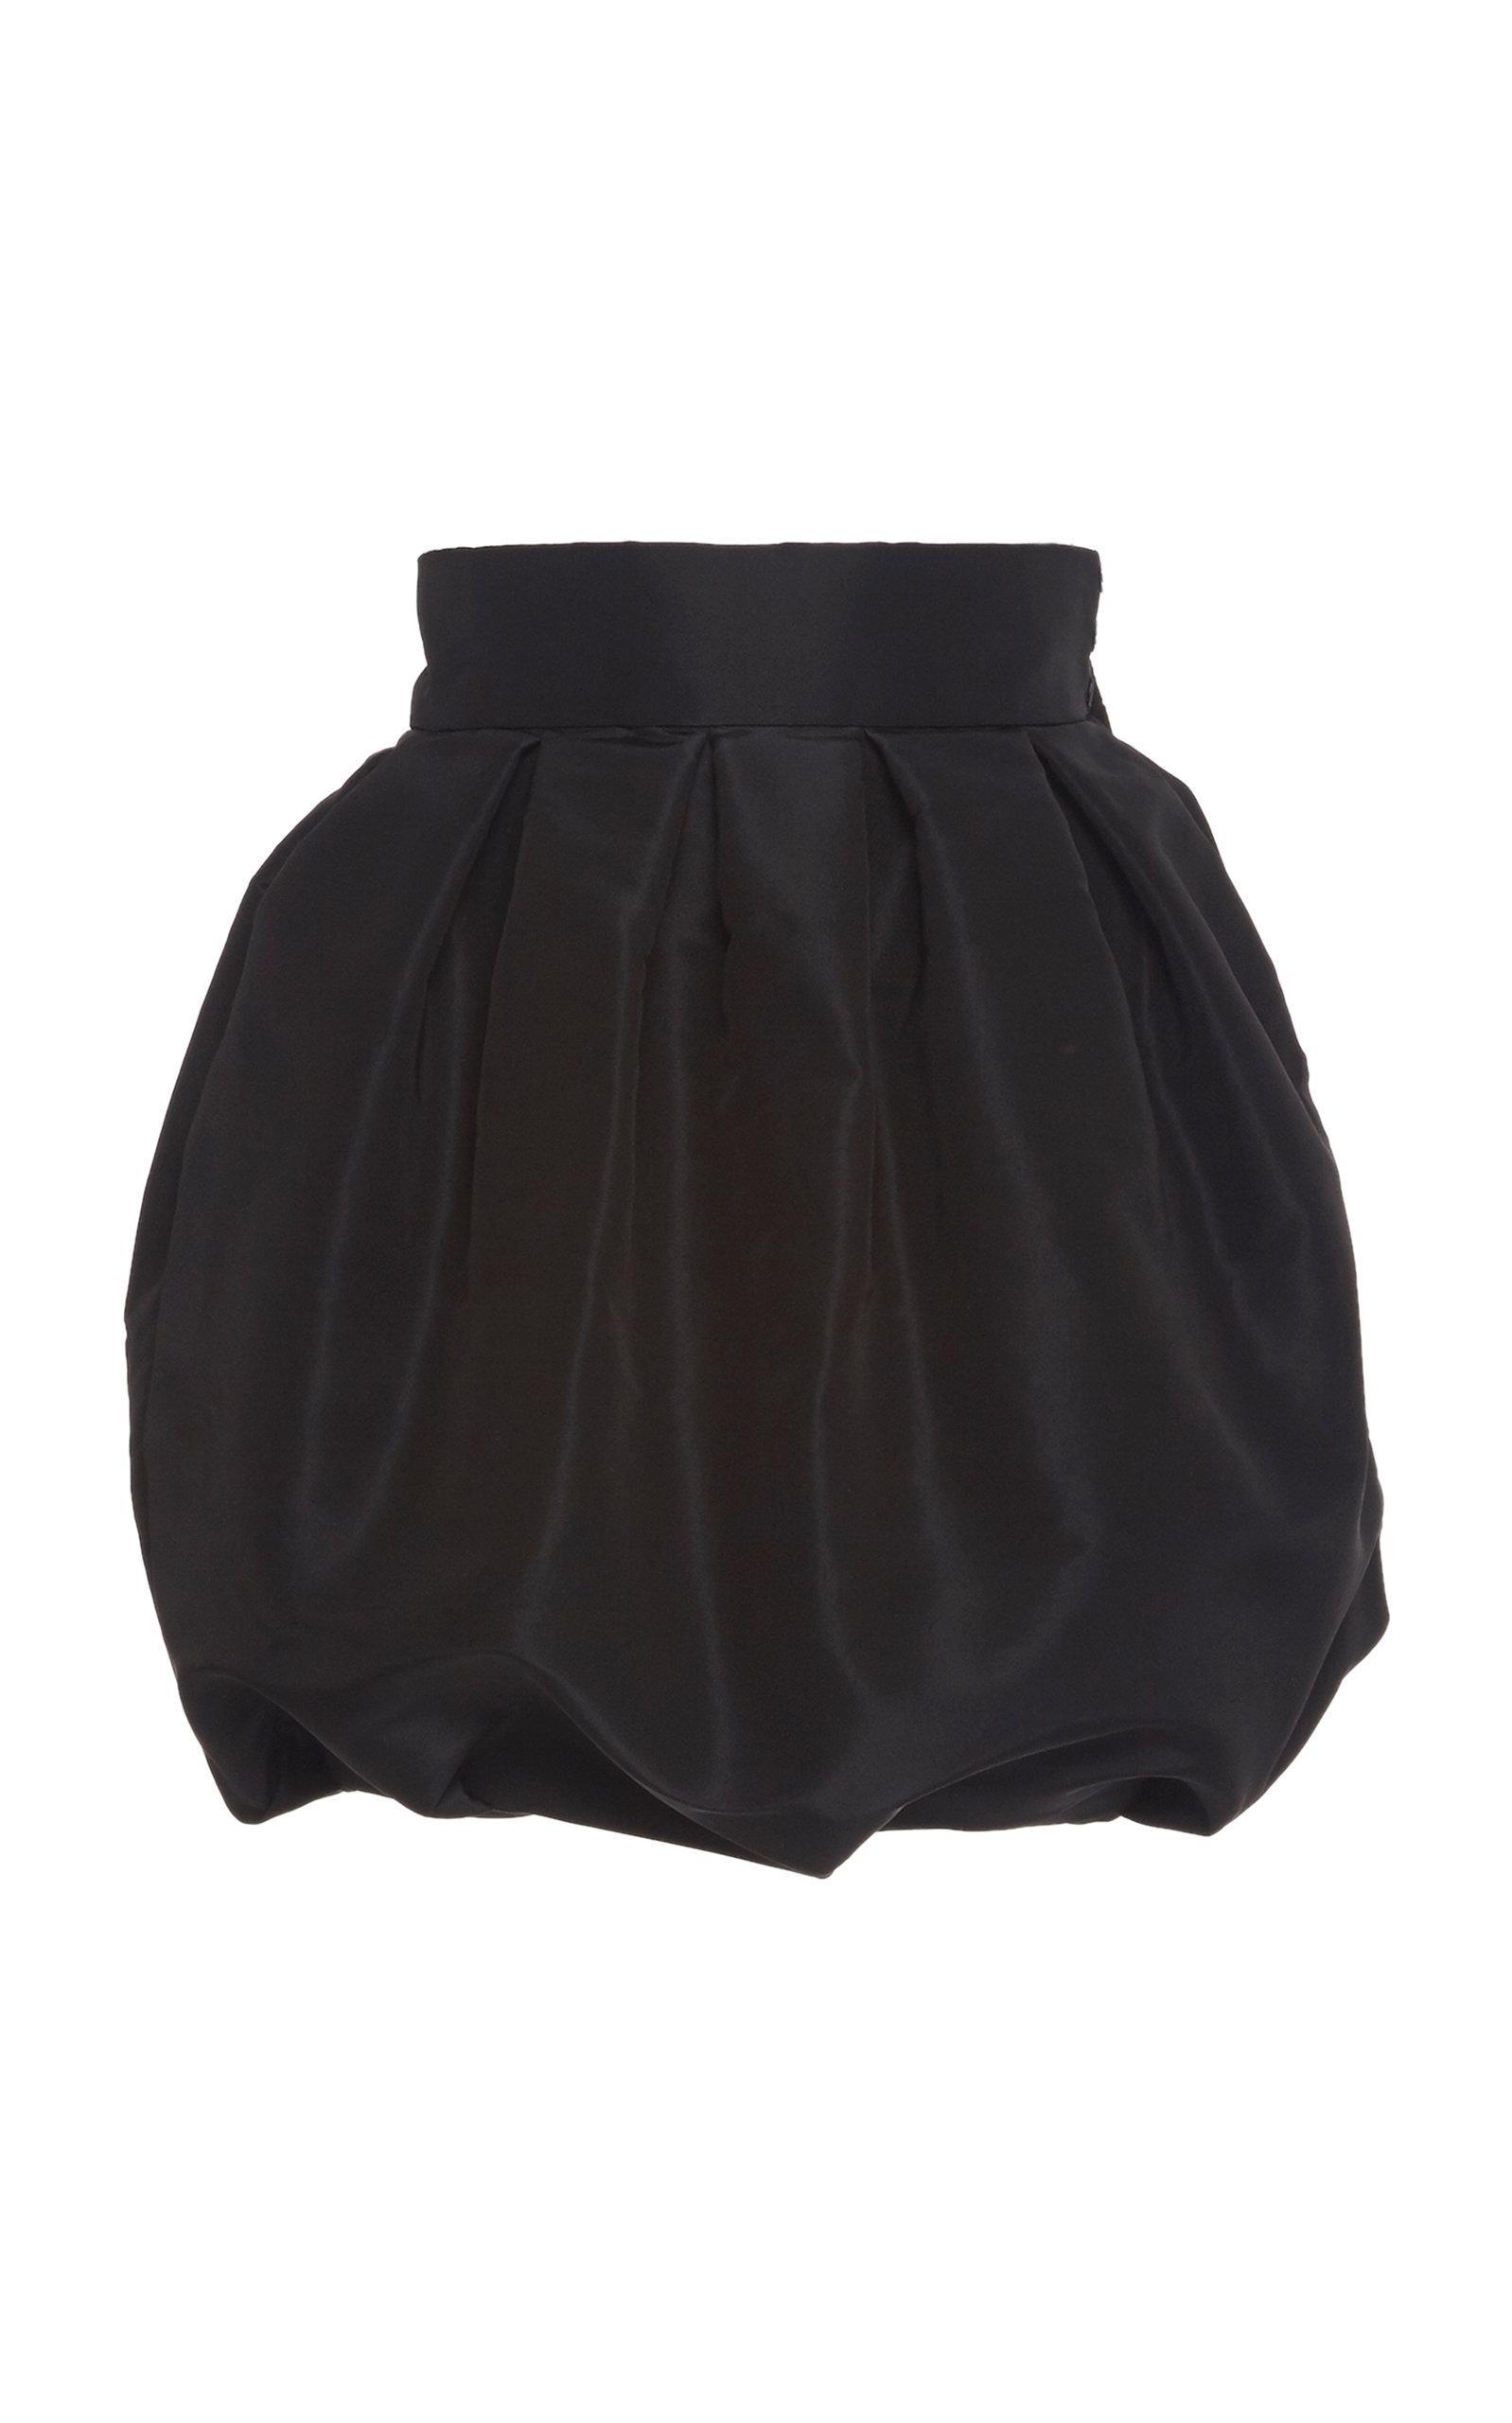 86d4ae7b Alexandre Vauthier Faille Bubble Skirt in Black - Lyst